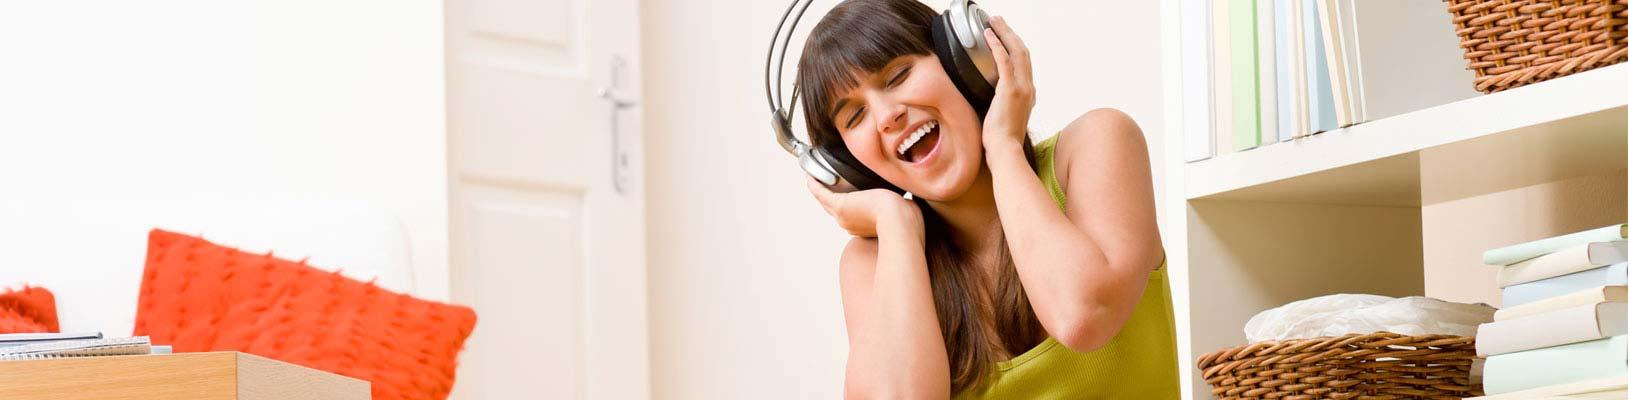 Audio, Video e Hi-Tech